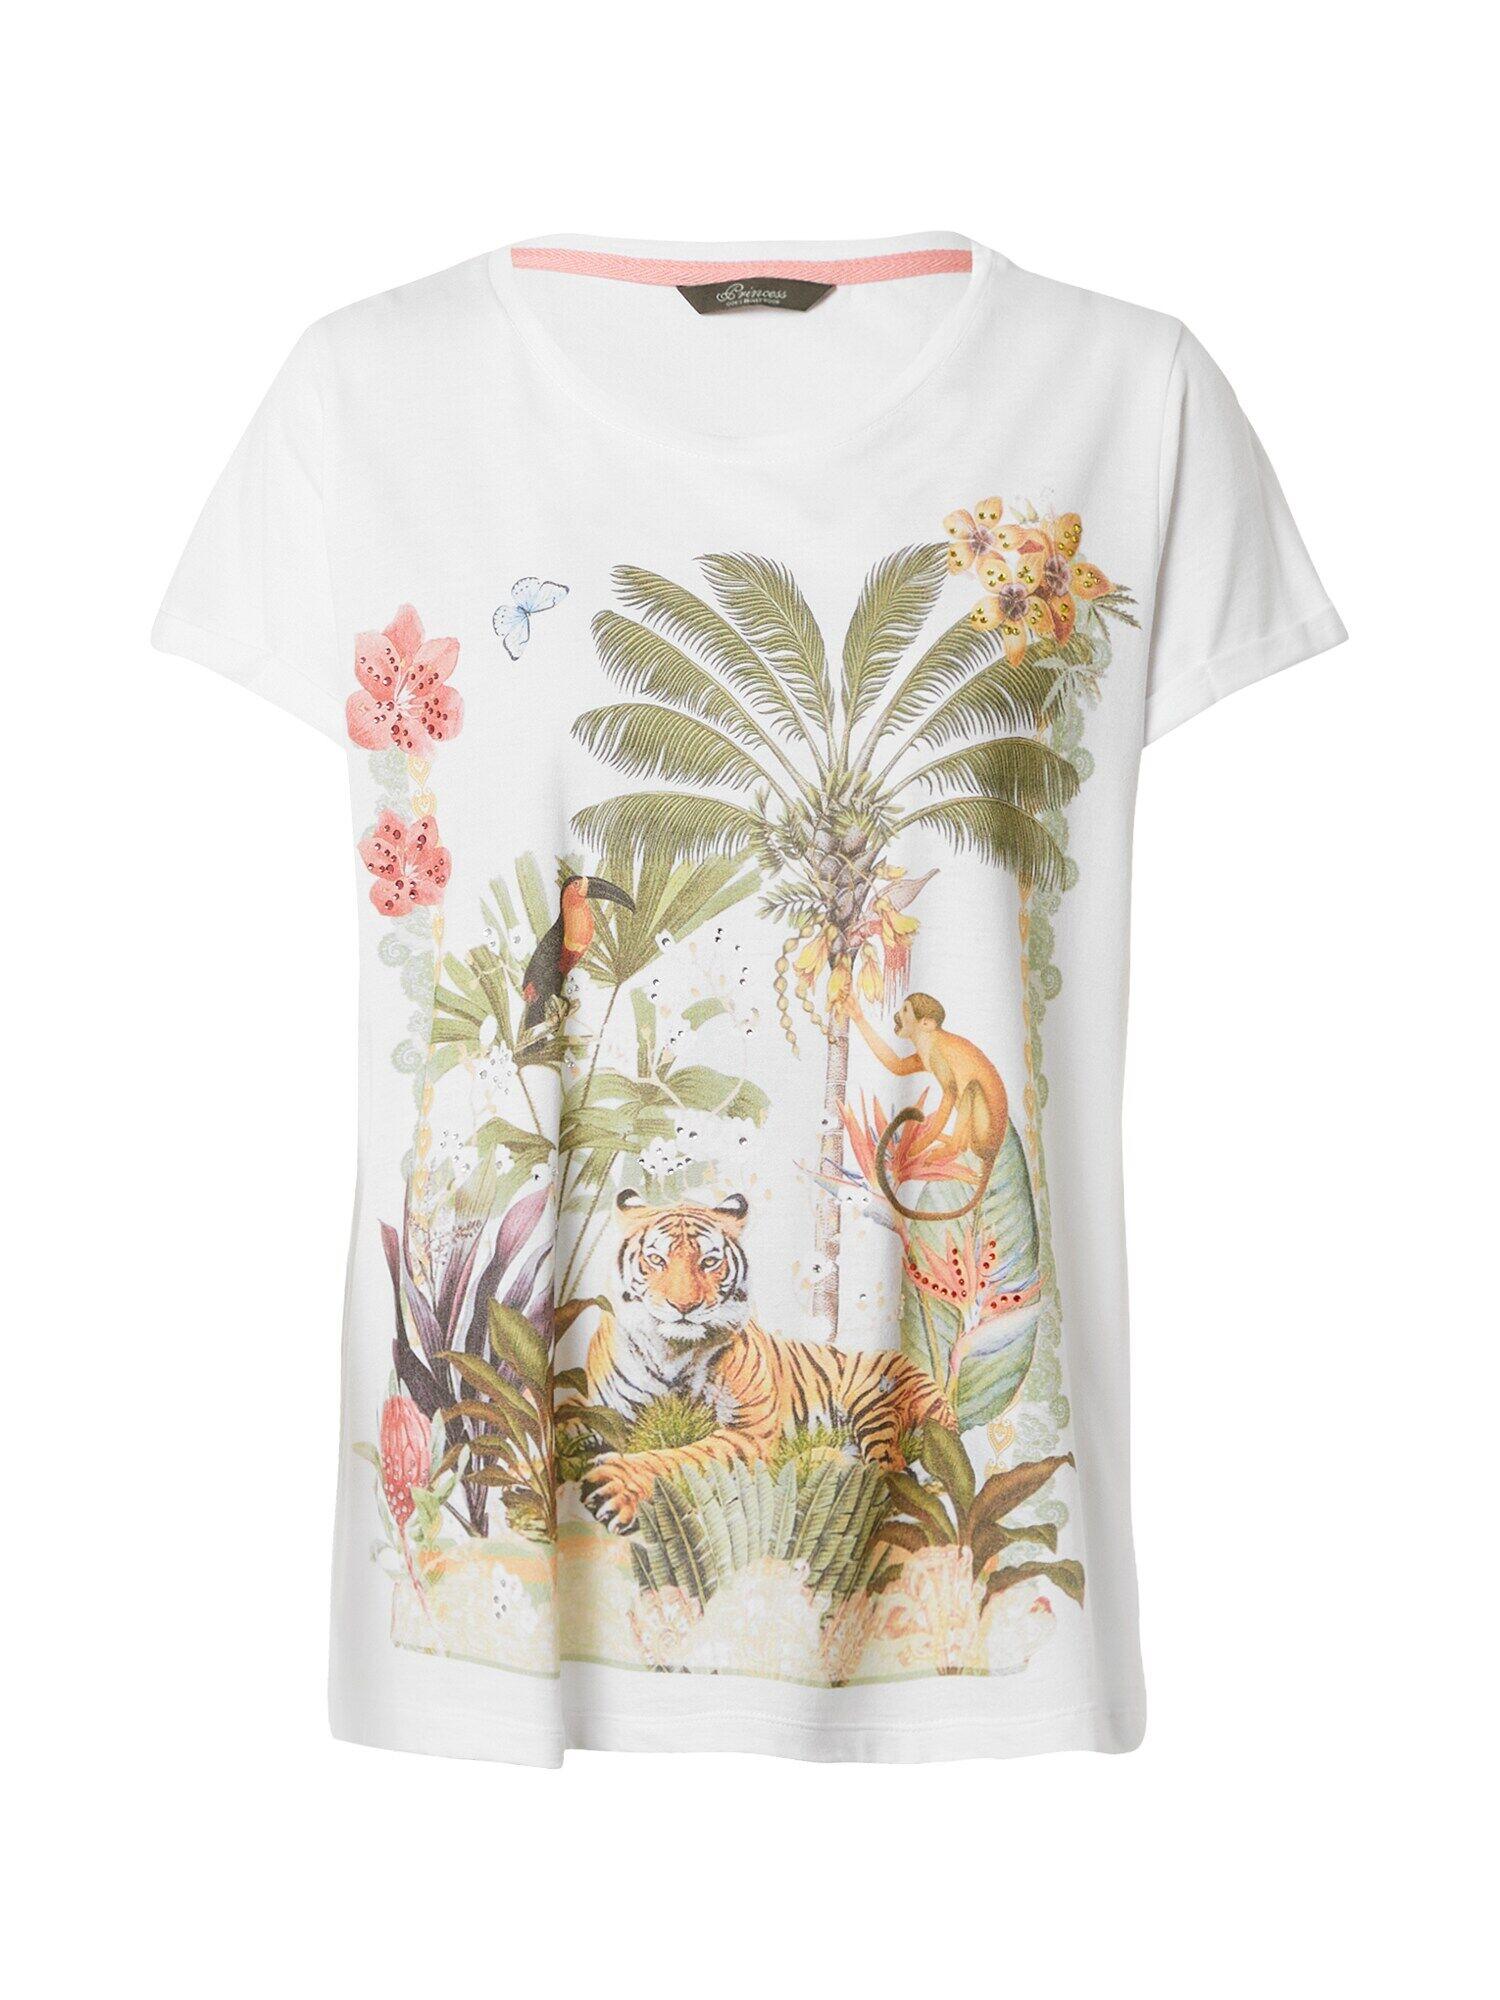 Princess T-shirt  - Blanc - Taille: S - female